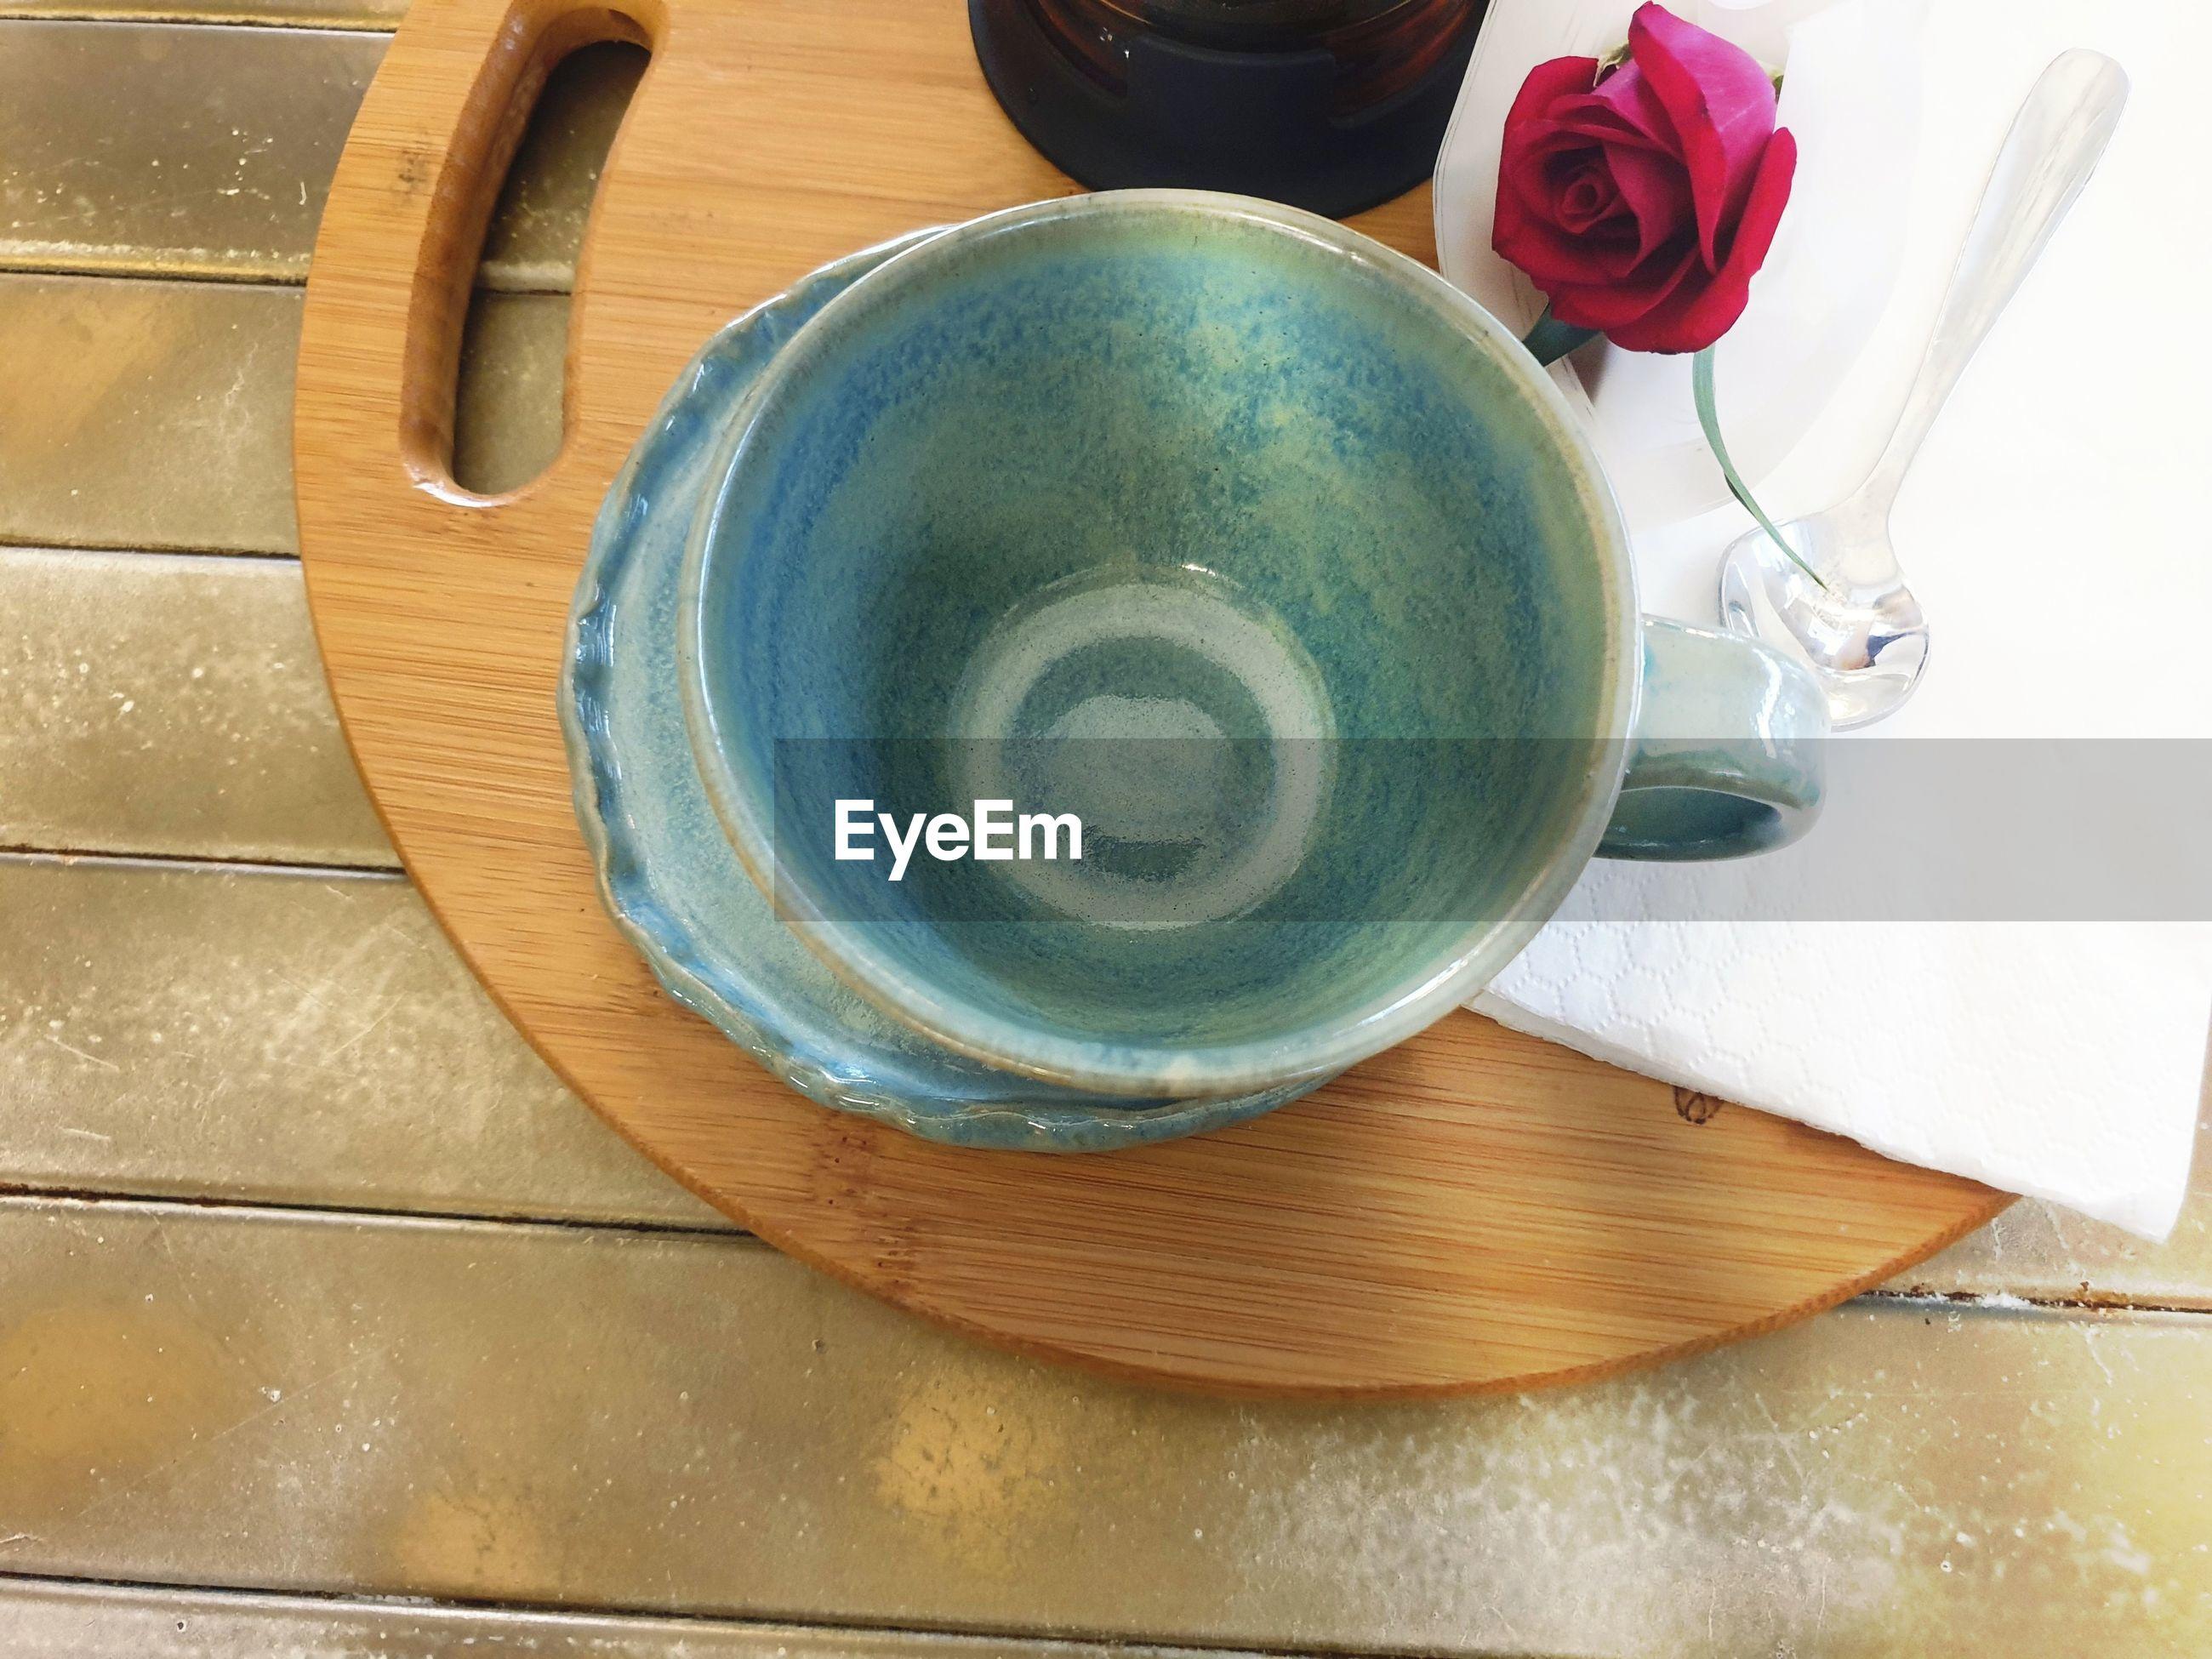 HIGH ANGLE VIEW OF CUP OF TEA